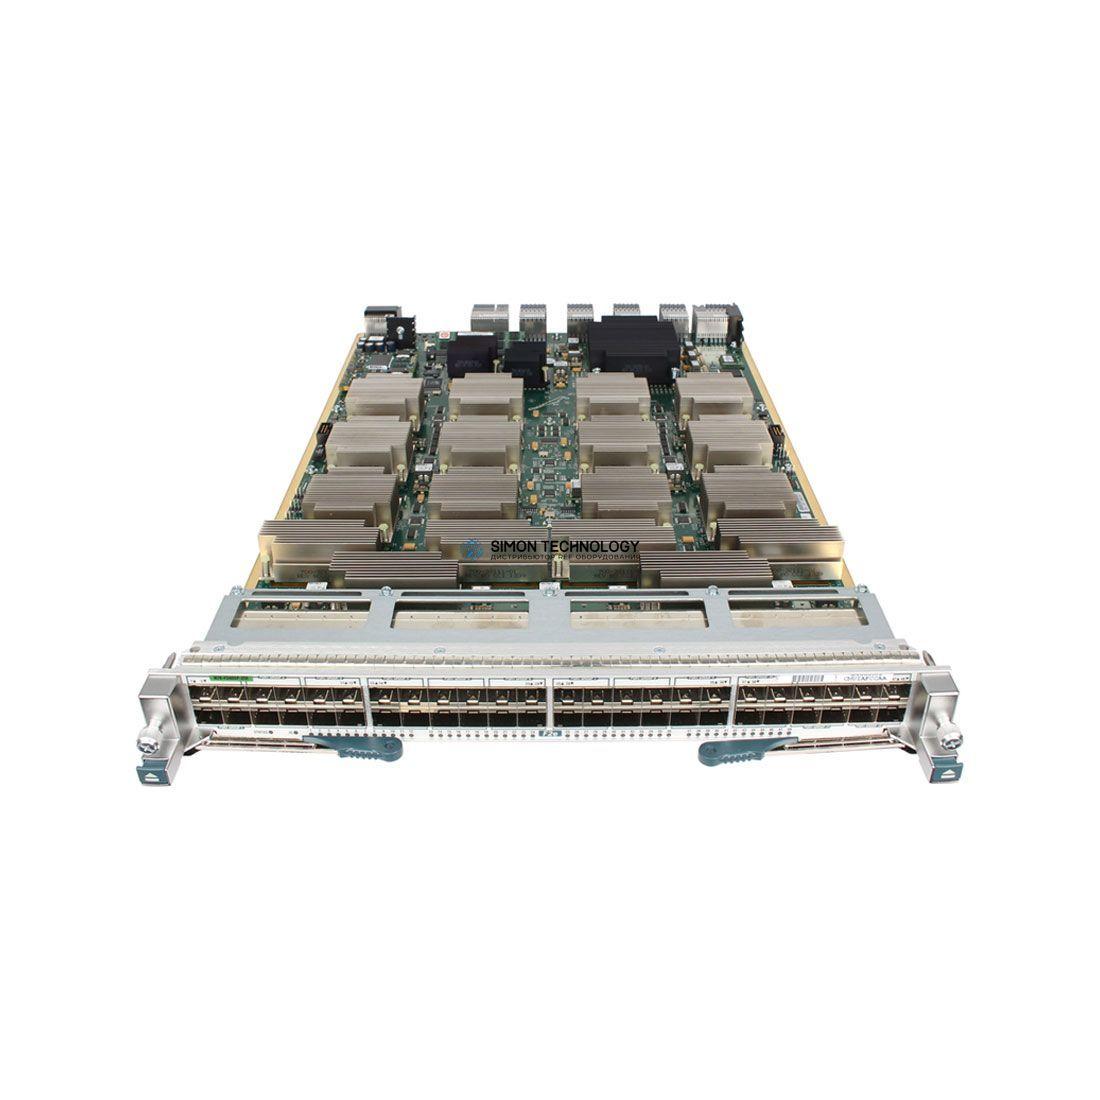 Модуль Cisco Cisco RF Nexus7000F2-Series48Port 1/10G (SFP+) (N7K-F248XP-25E-RF)